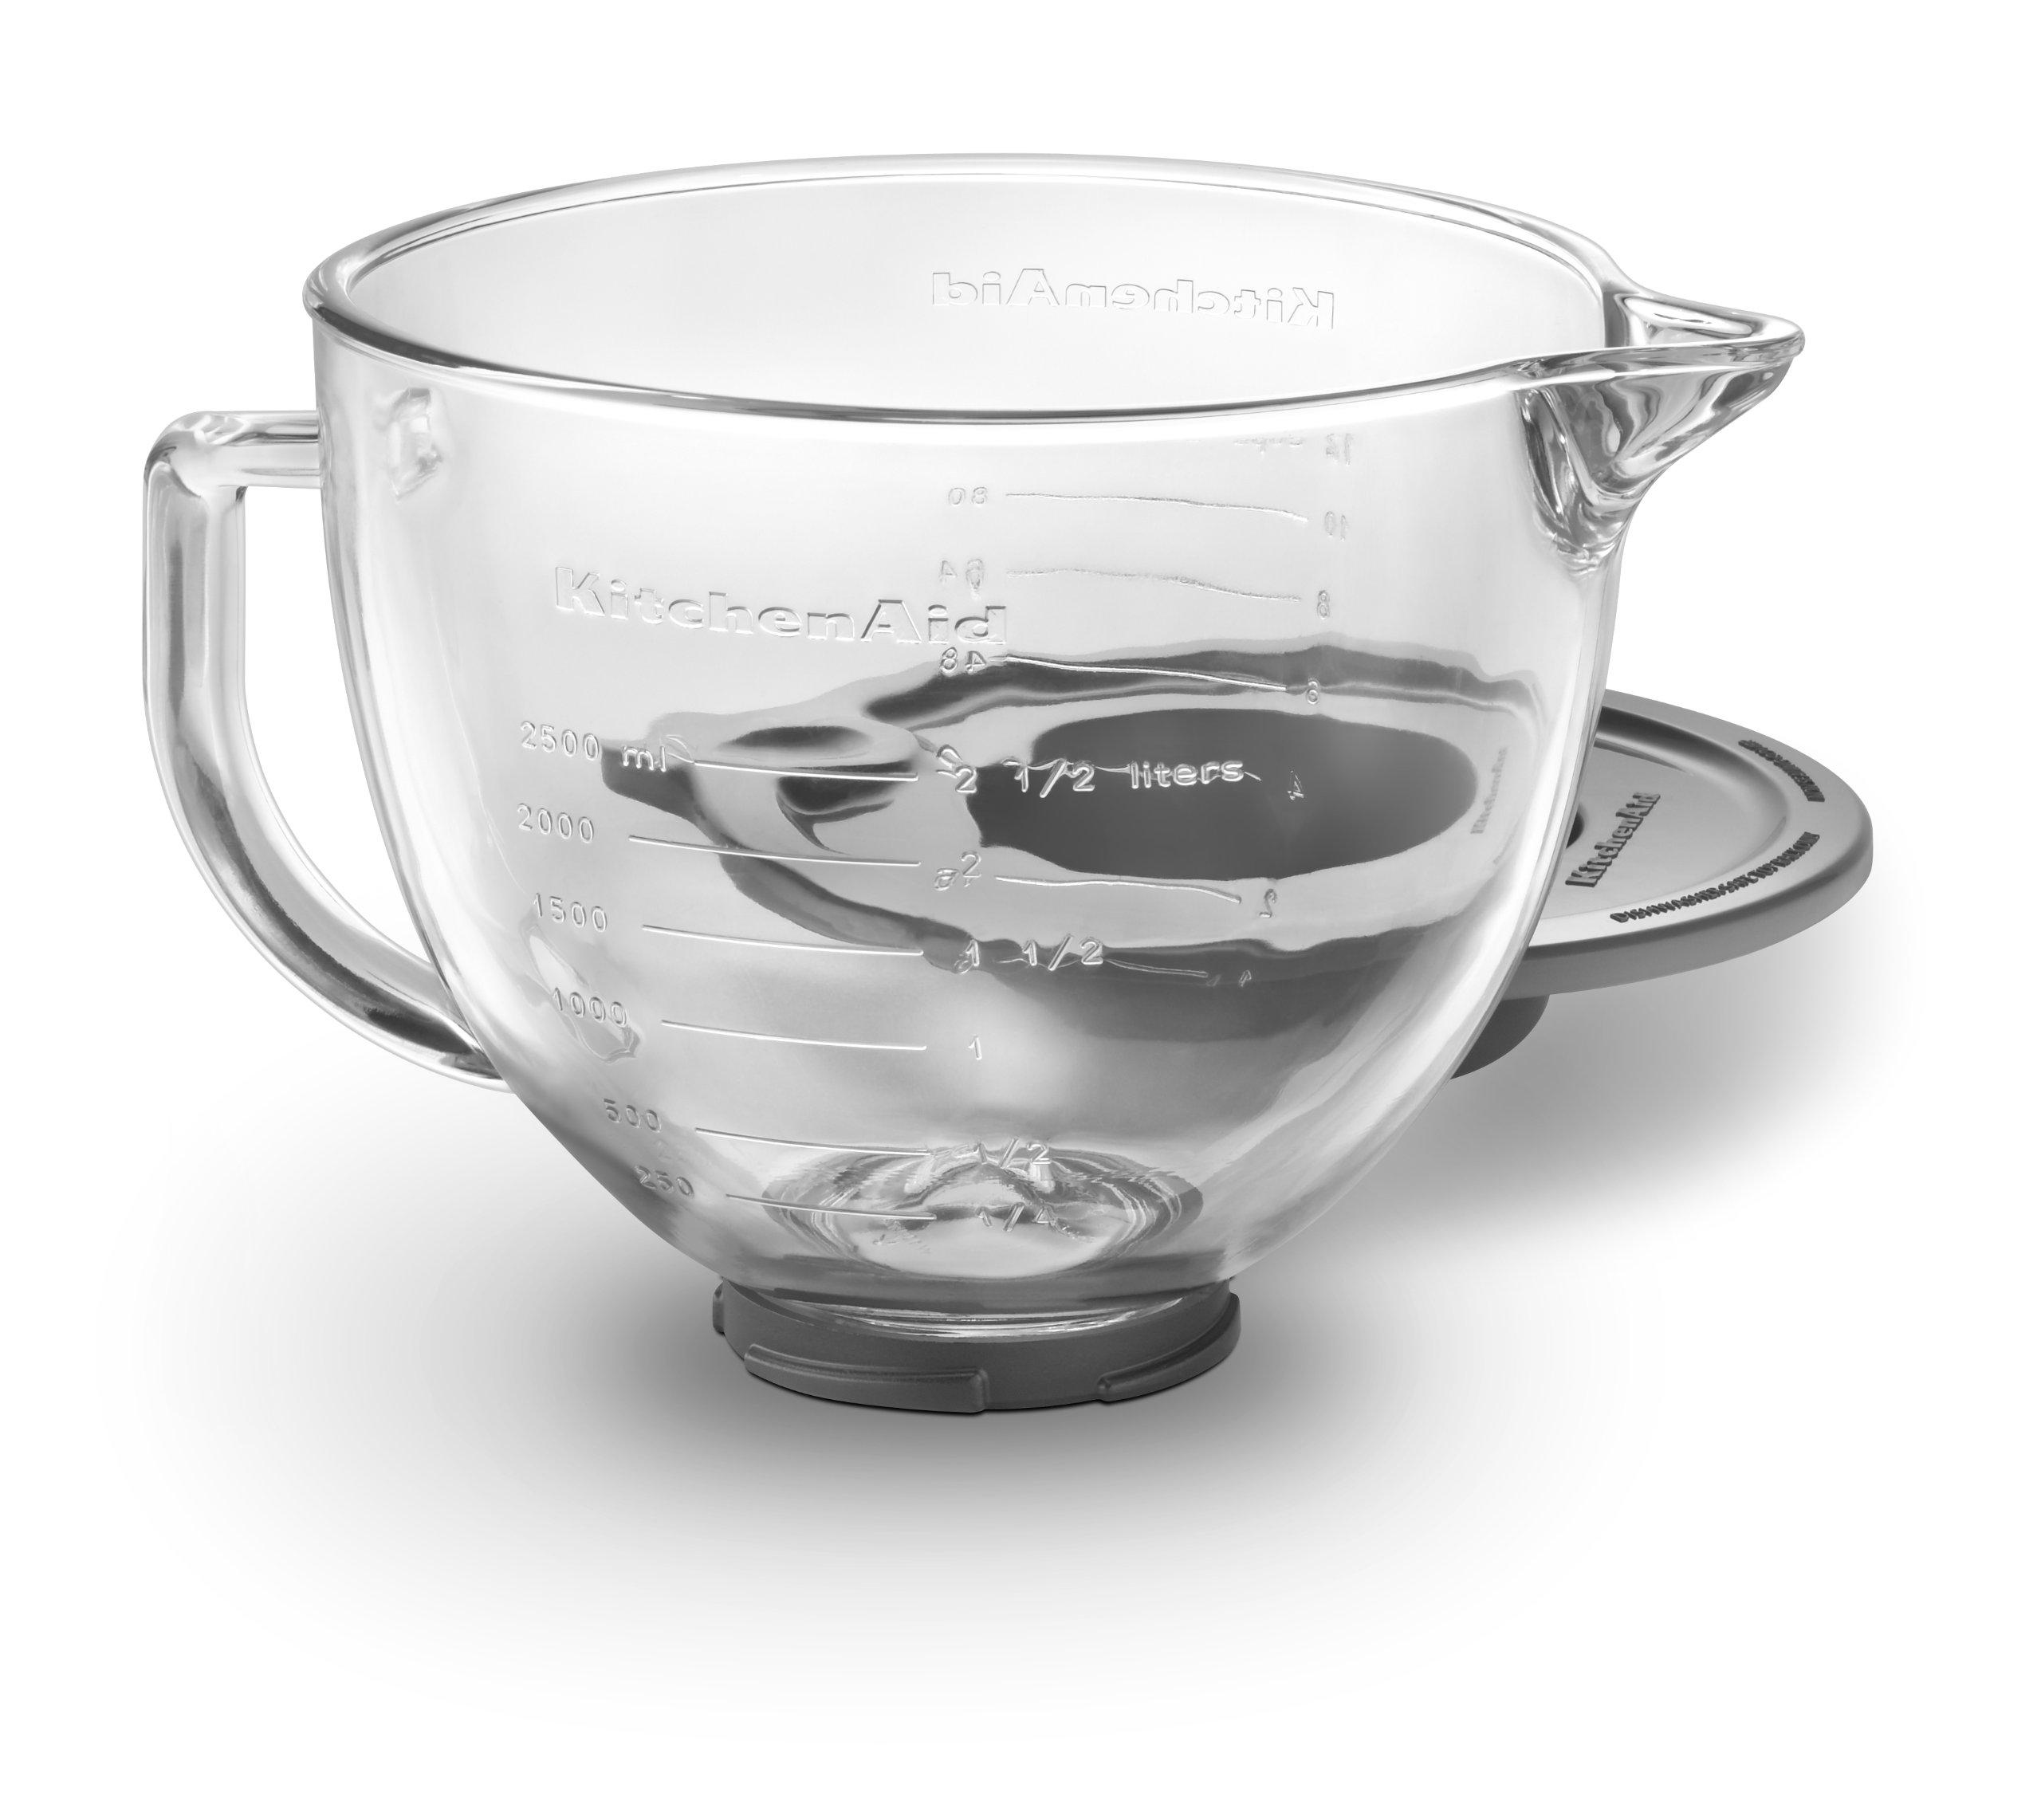 KitchenAid K5GB 5-Qt. Tilt-Head Glass Bowl with Measurement Markings & Lid by KitchenAid (Image #2)